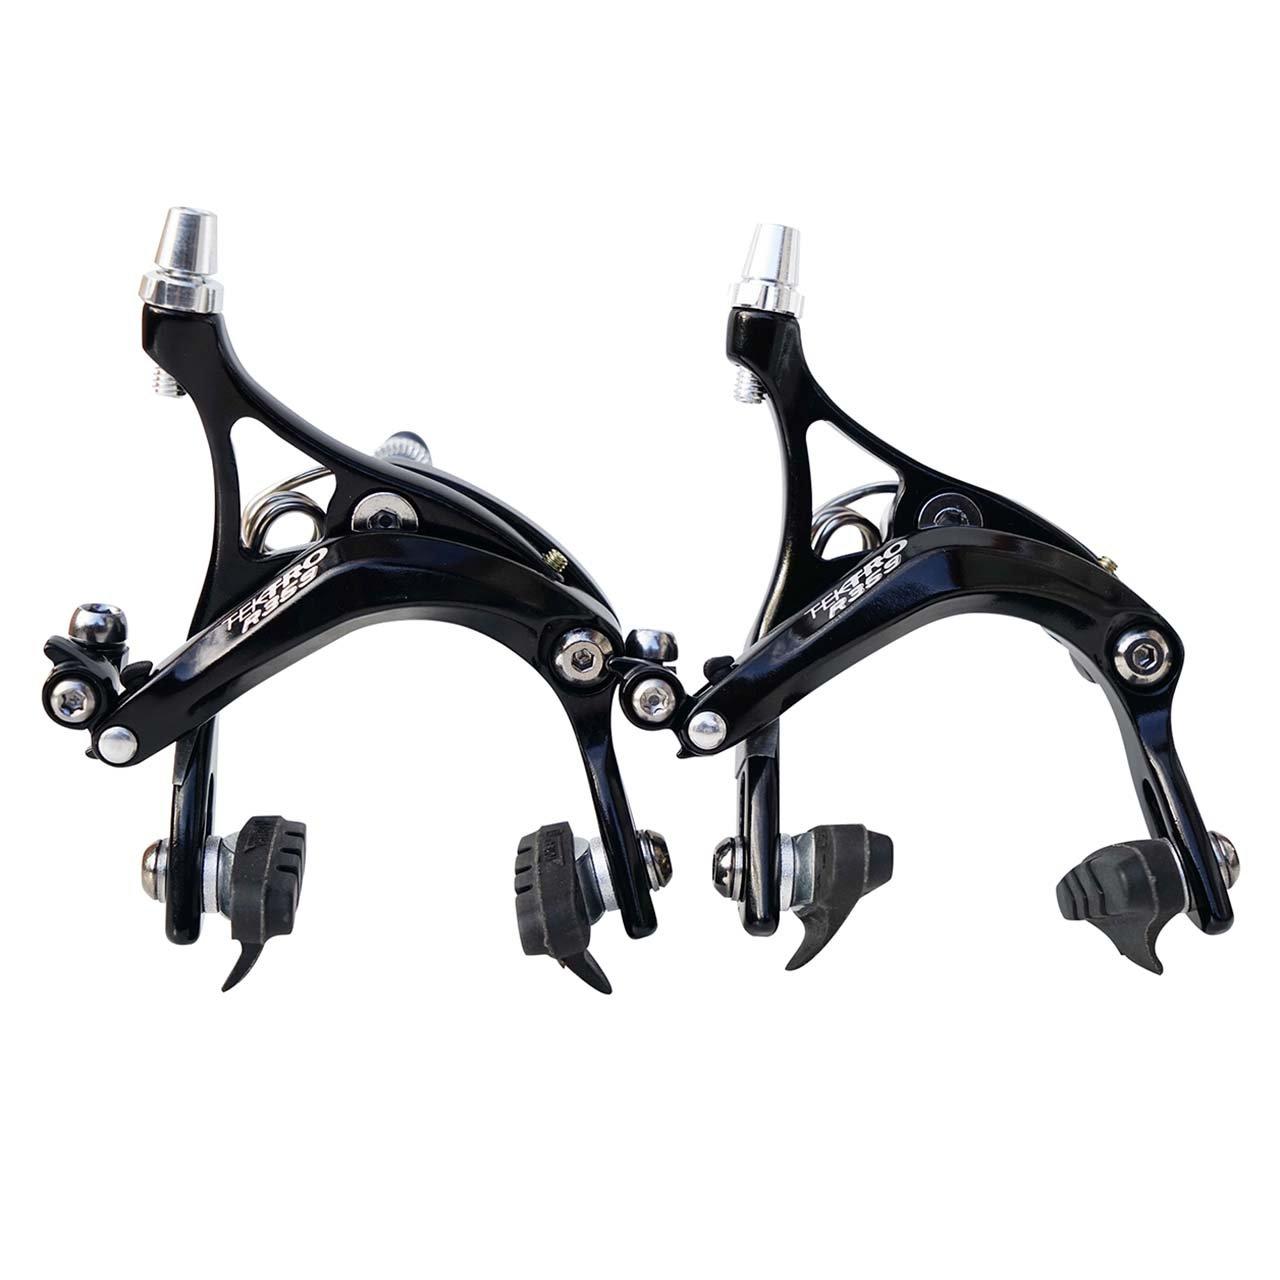 Nuevo Tektro R359 47 de 57 millimeter larga caida bicicleta freno Dormitar - negro o plata Negro negro